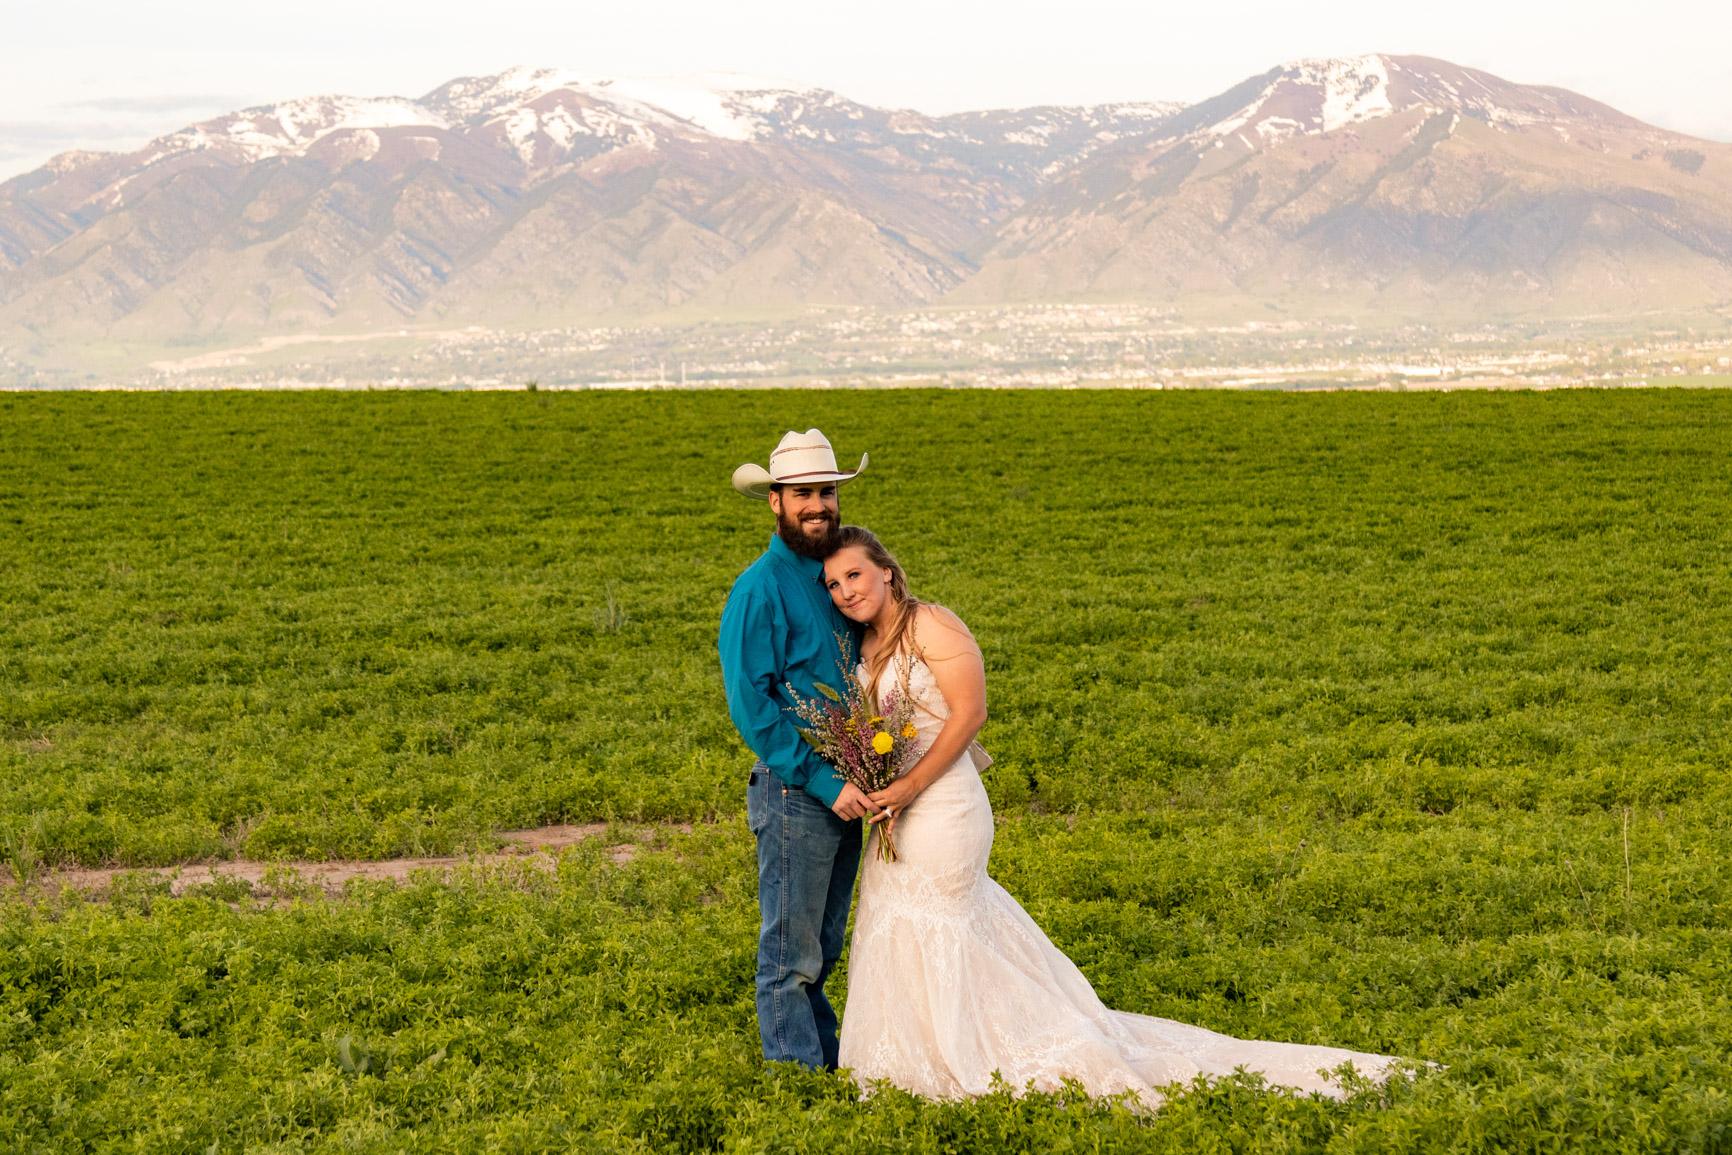 Utah Rocky Mountain Elopement Wasatch Mountains Bridal Shoot Halie West Adventure Photography 14